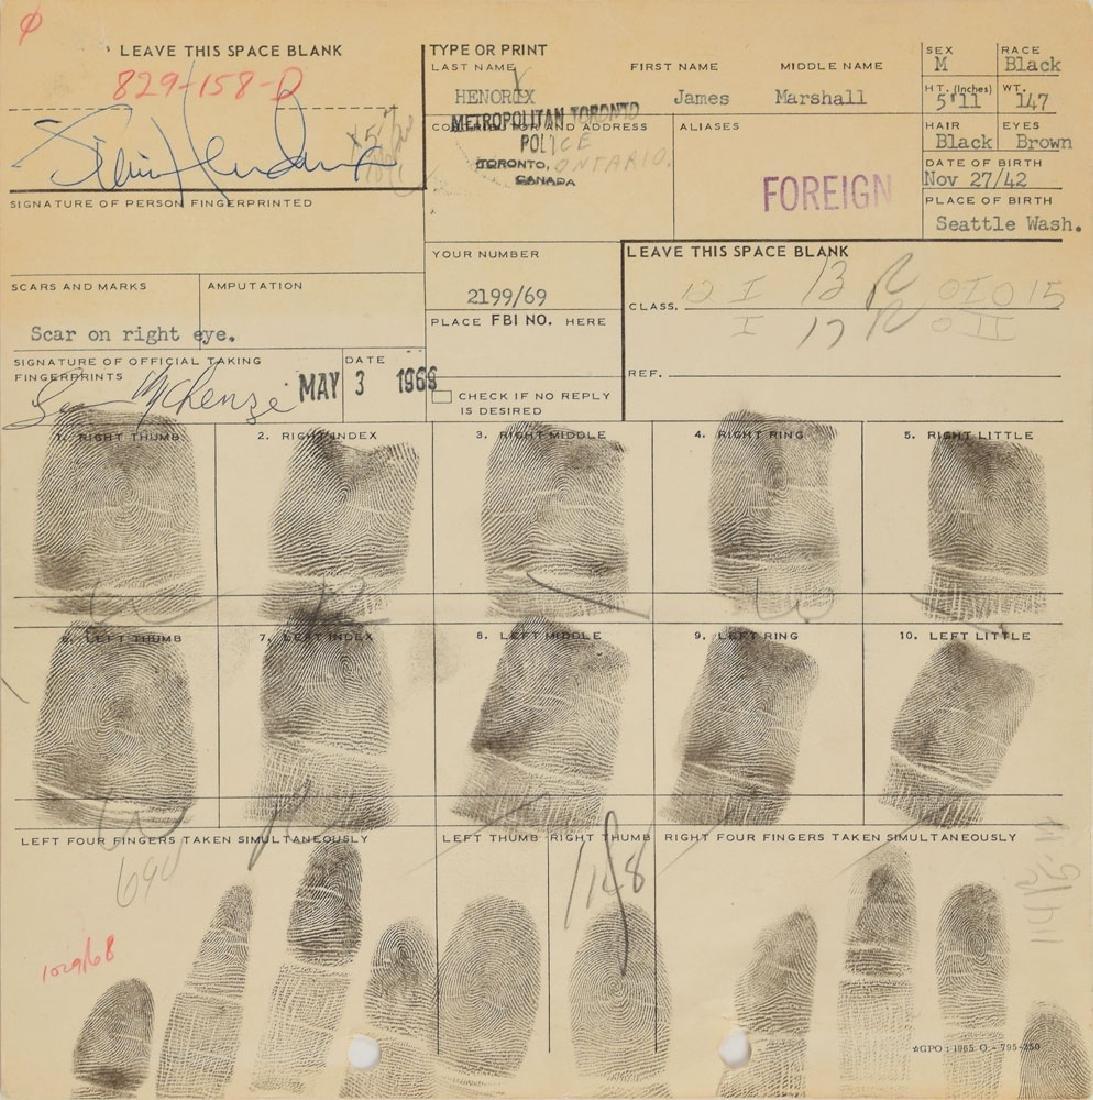 Jimi Hendrix Signed 1969 Toronto Arrest Fingerprint Card